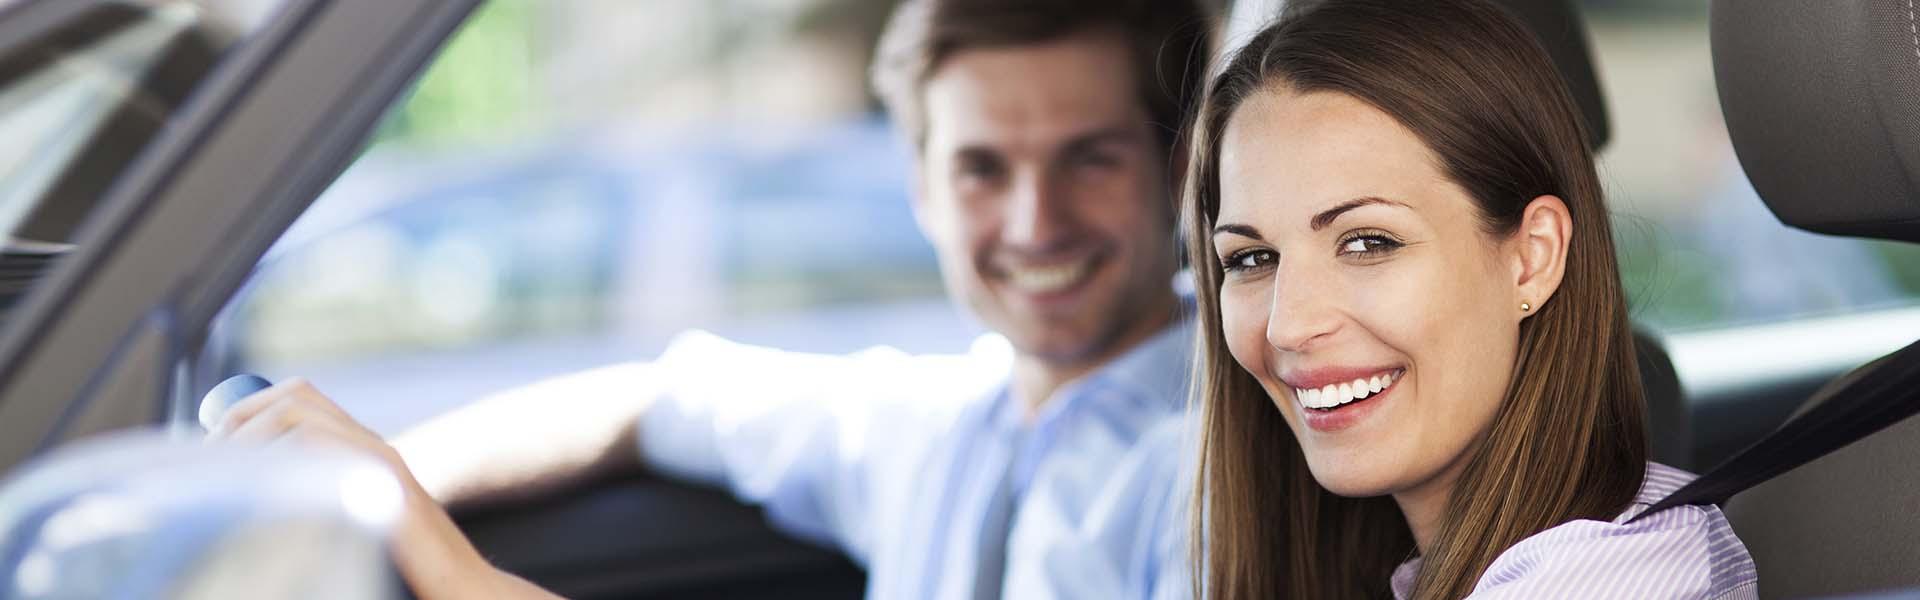 auto-insurance-danis